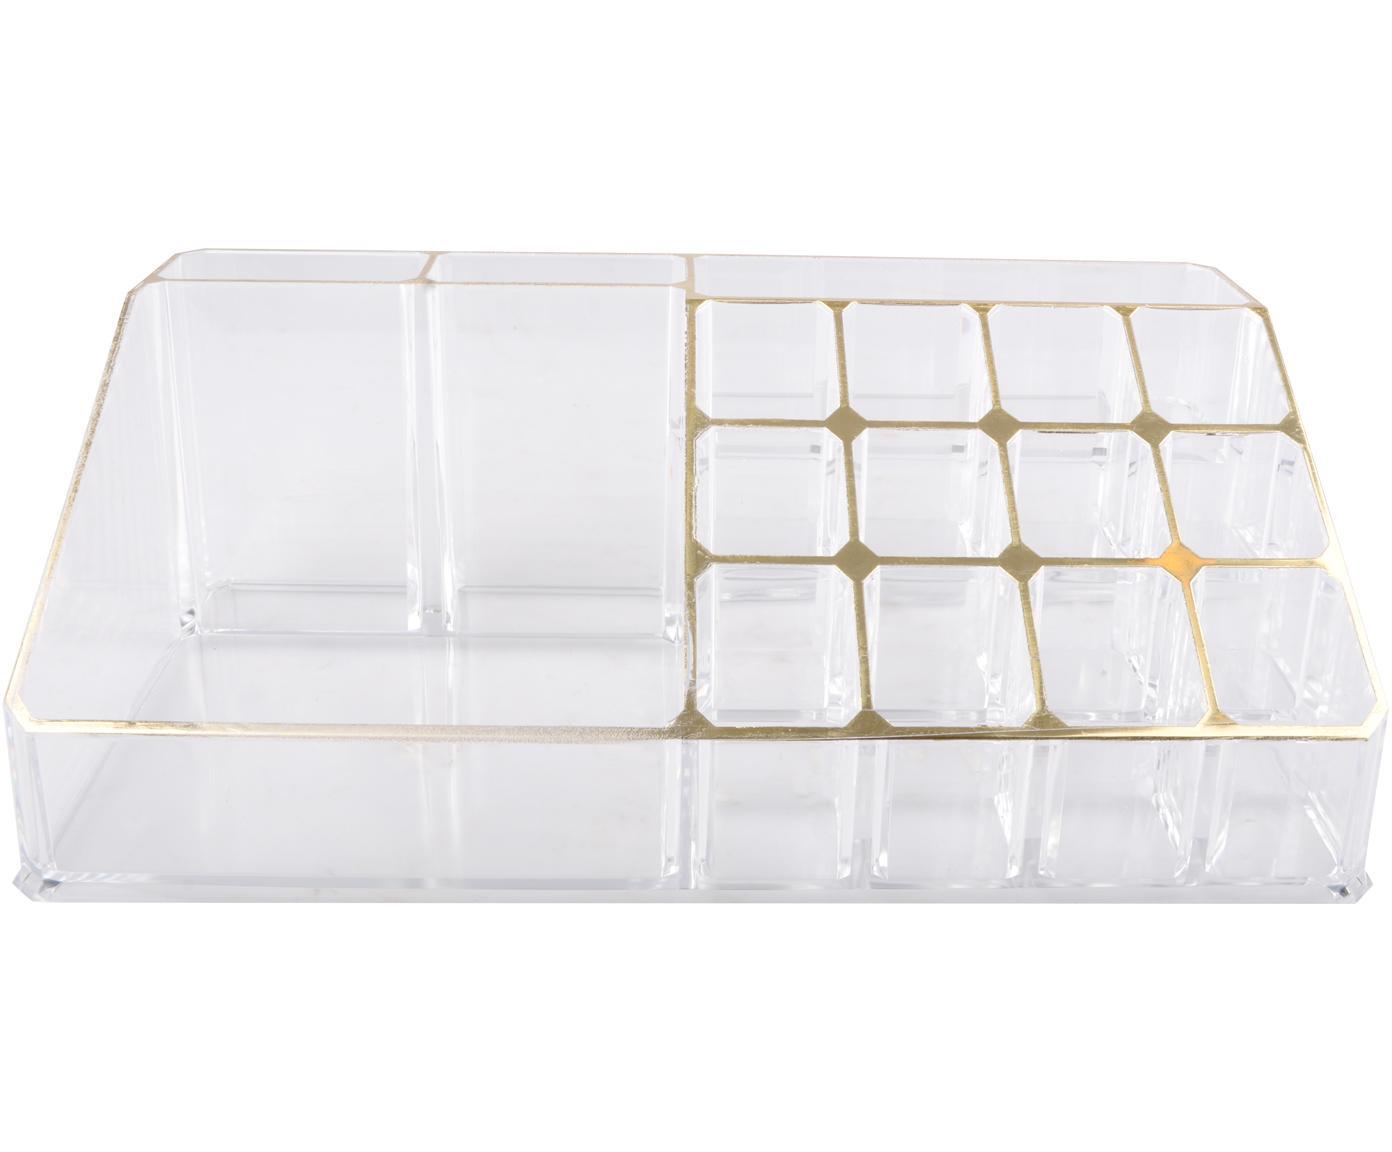 Kosmetik-Organizer Malla, Kunststoff, Transparent, Goldfarben, 22 x 8 cm